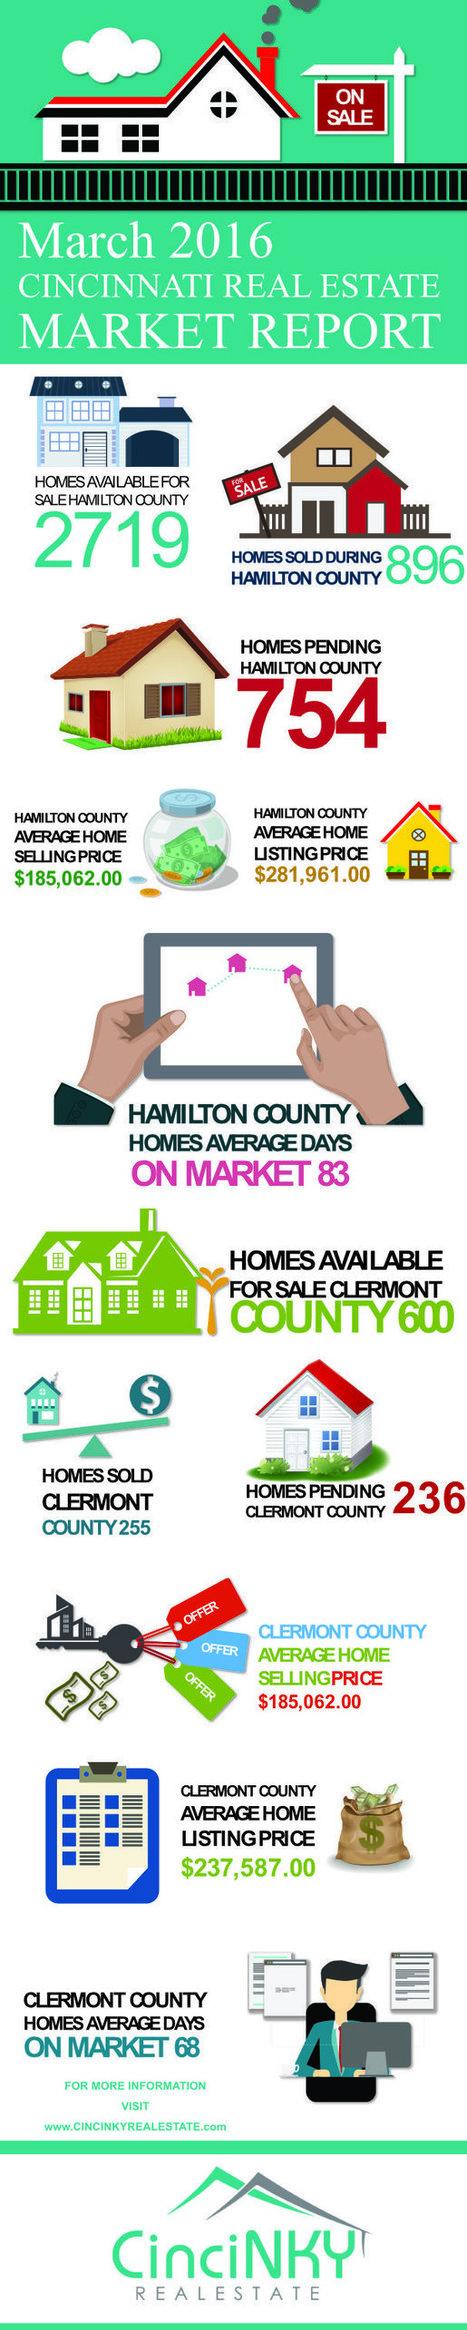 March 2016 Greater Cincinnati Real Estate Market Report - Cincinnati and Northern Kentucky Real Estate   Real Estate   Scoop.it